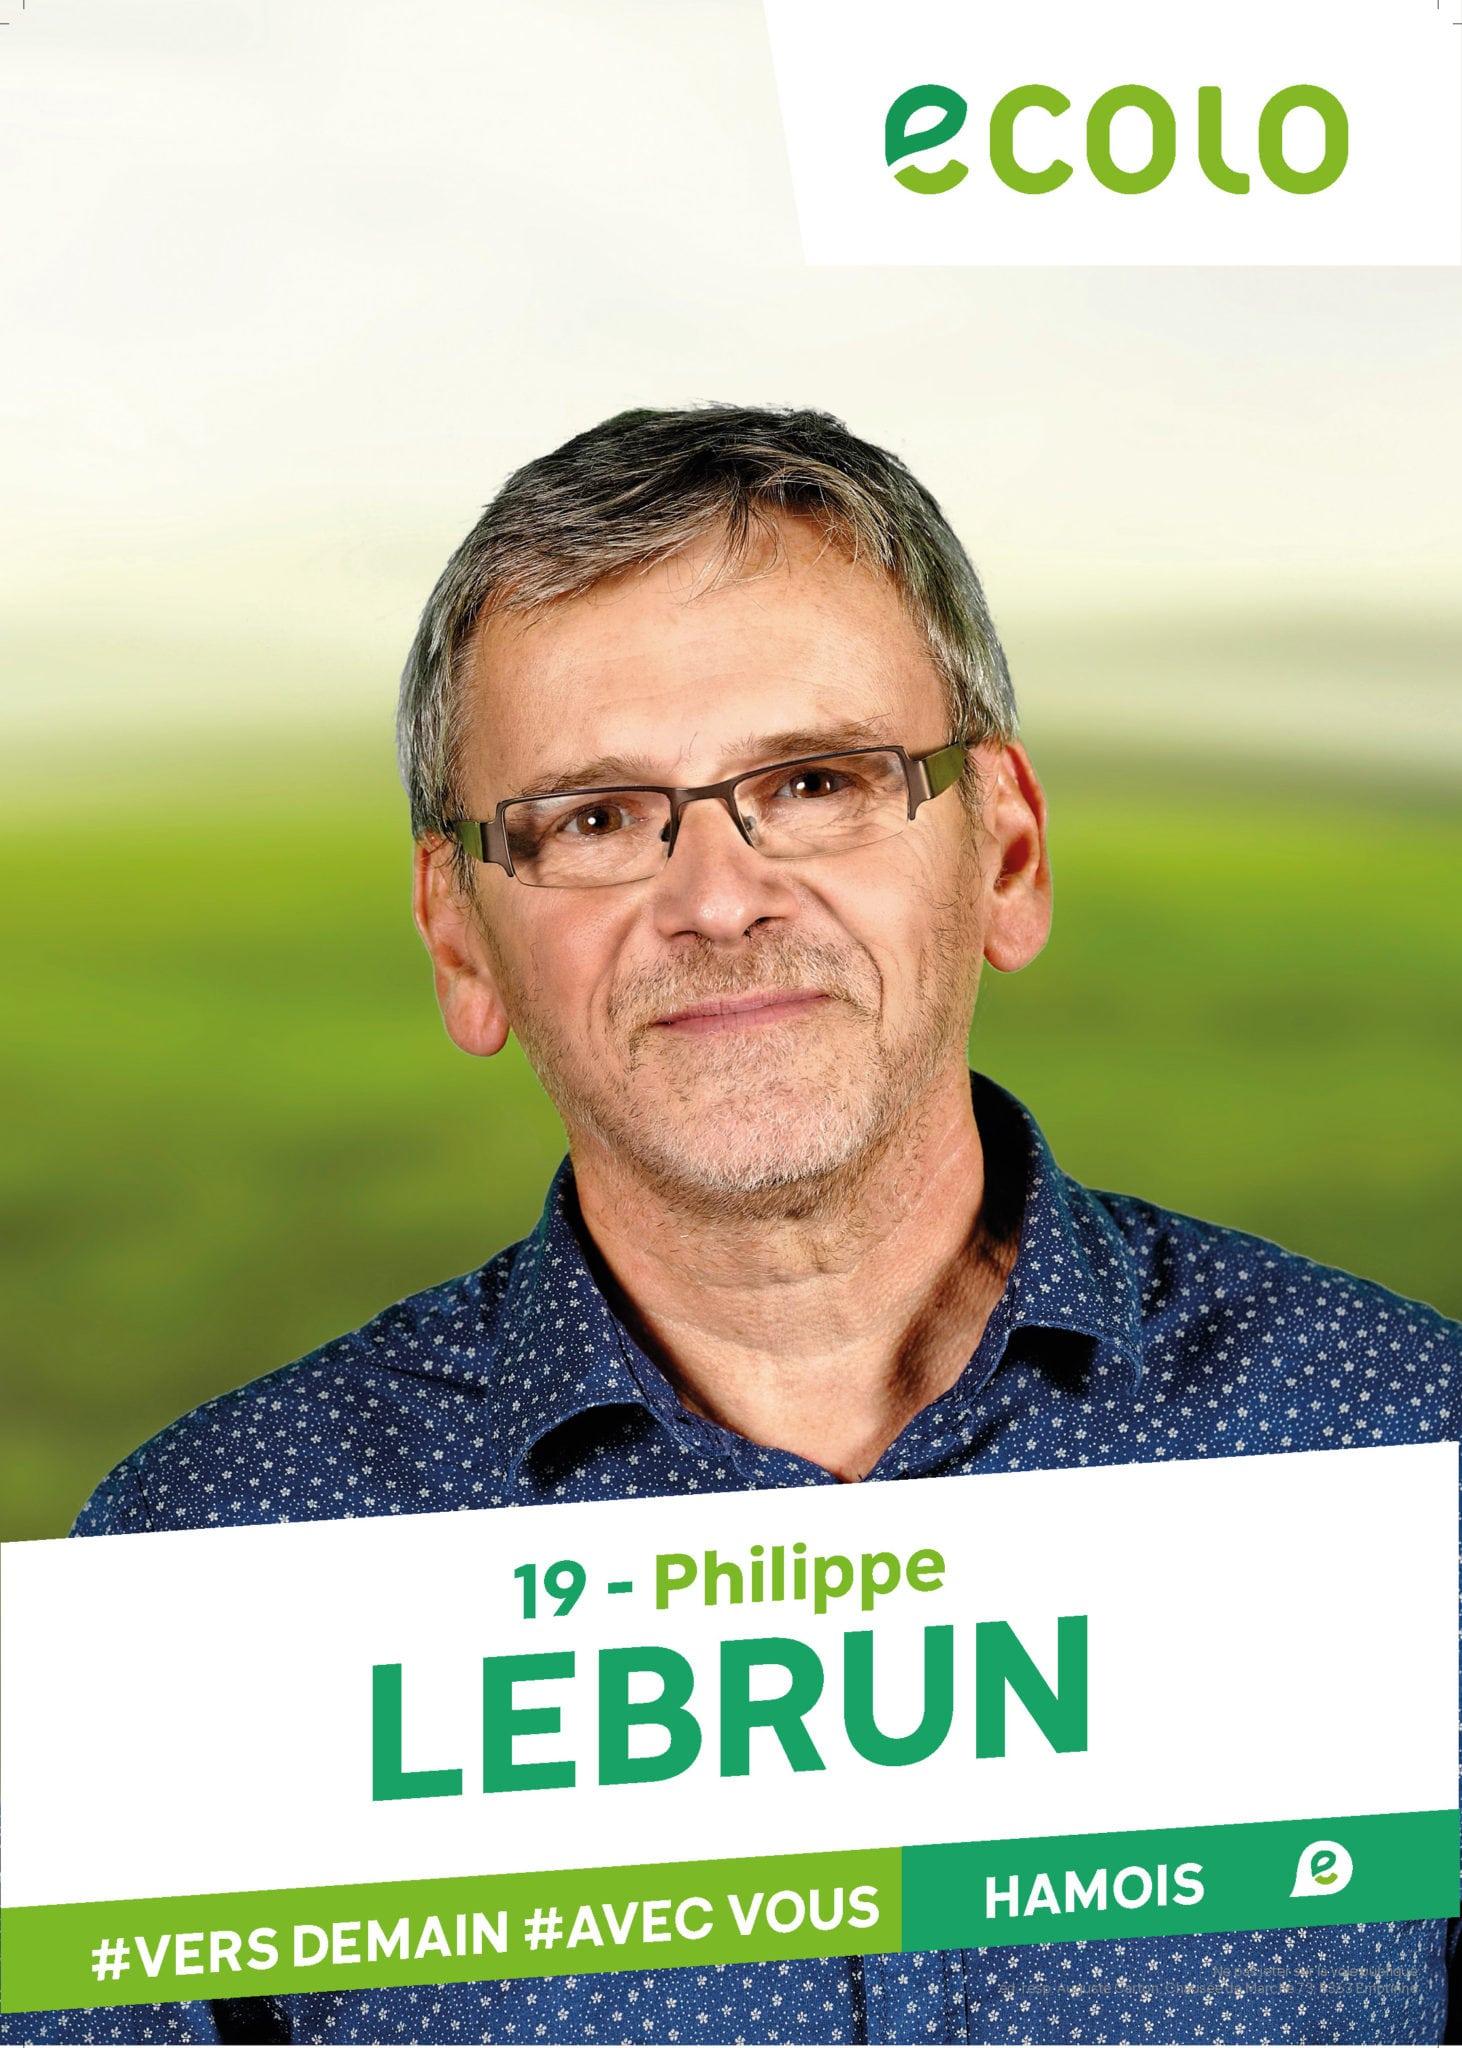 19 - Philippe LEBRUN